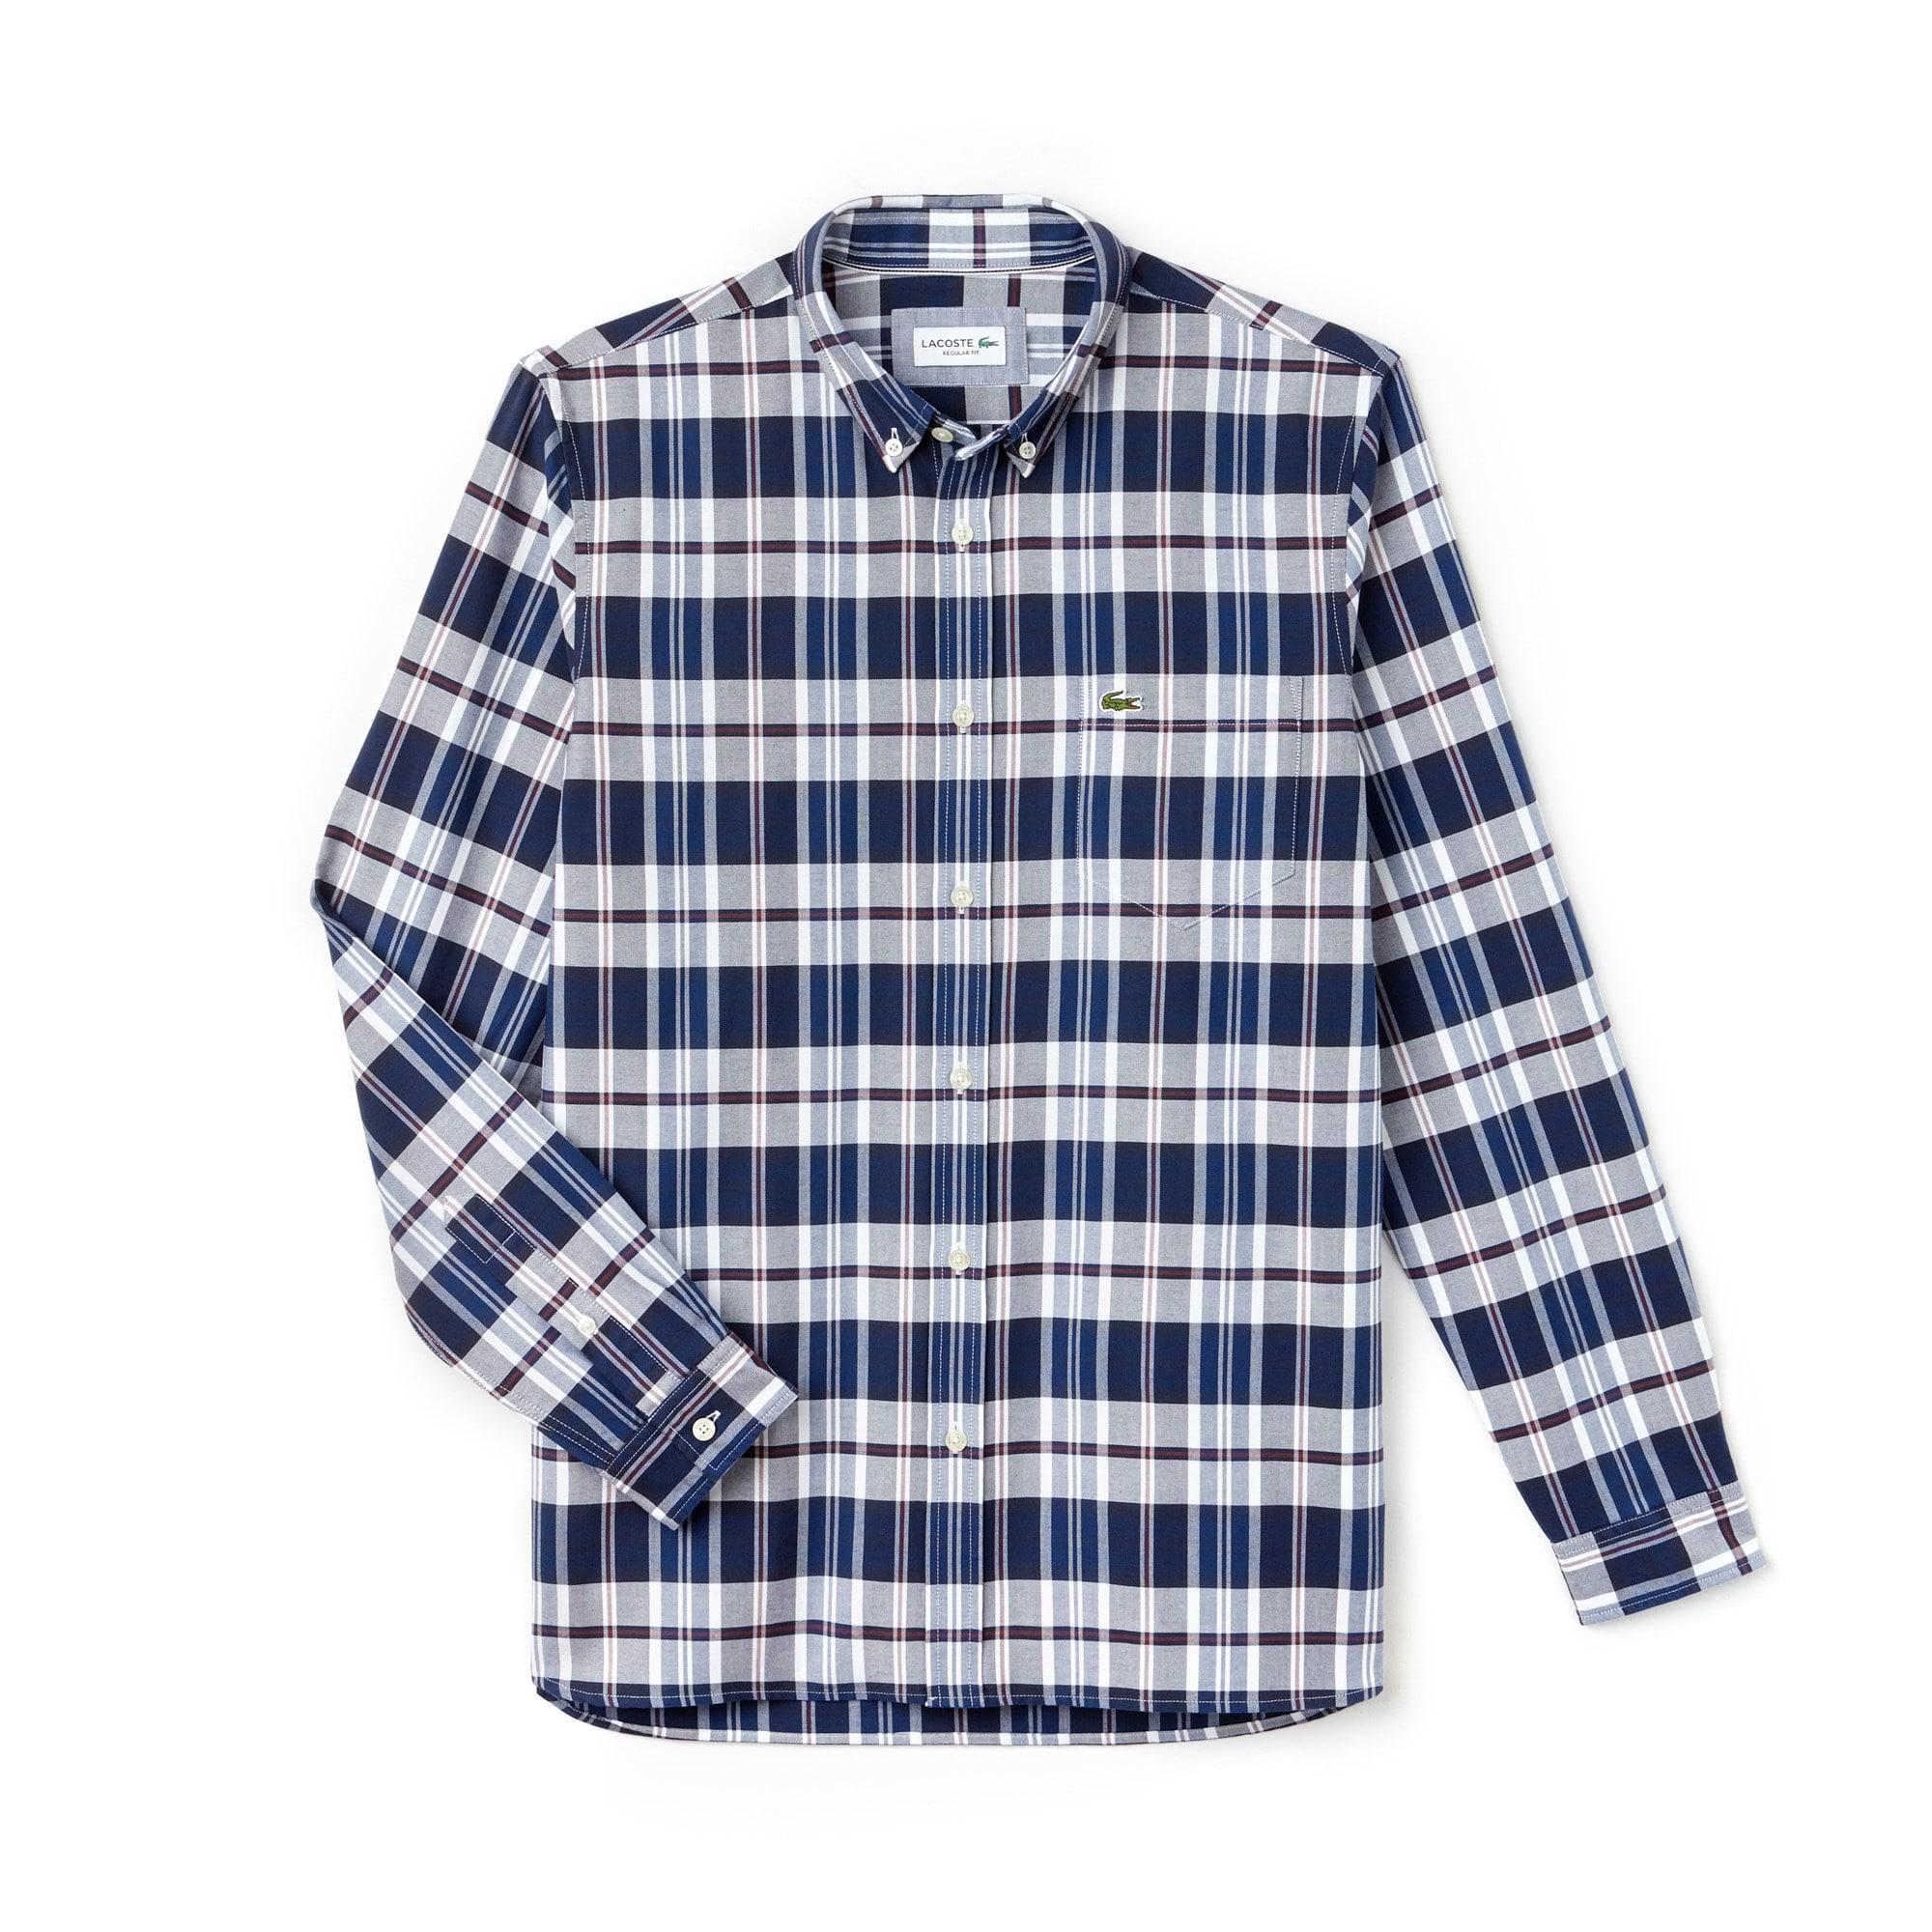 Men's Regular Fit Colored Check Cotton Oxford Shirt